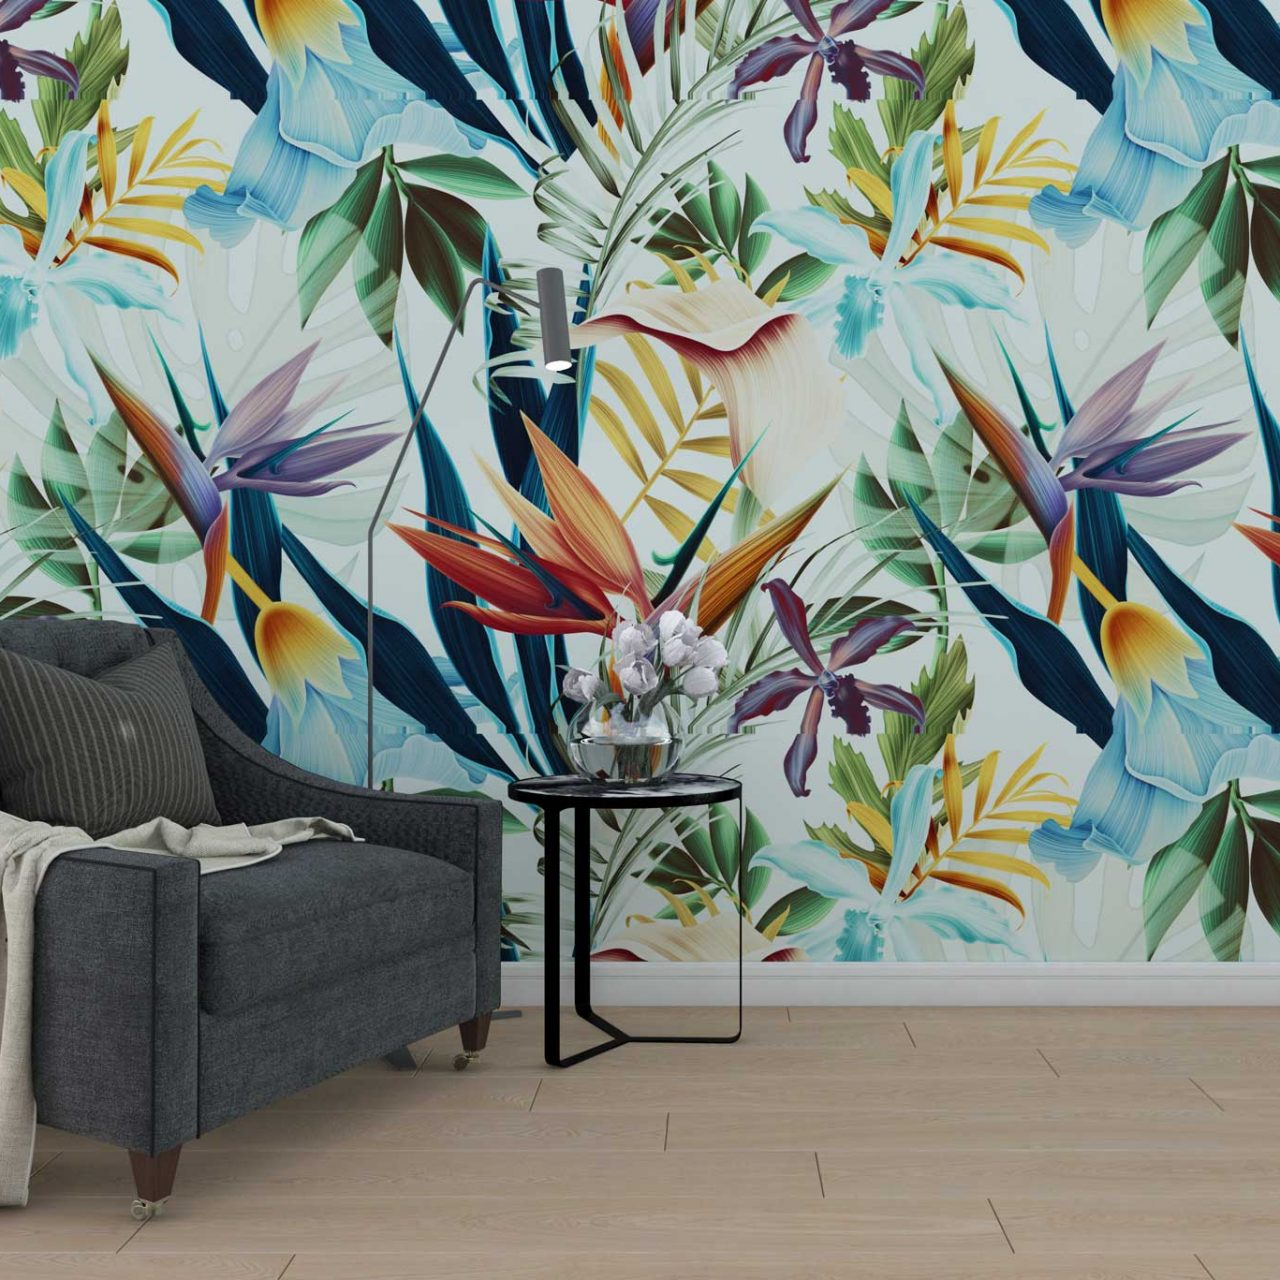 https://daringprints.ro/wp-content/uploads/2020/12/tapet-fototapet-design-personalizat-comanda-customizabil-bucuresti-daring-prints-flori-model-motiv-vegetal-frunze-exotic-multicolor-colorat-1280x1280.jpg